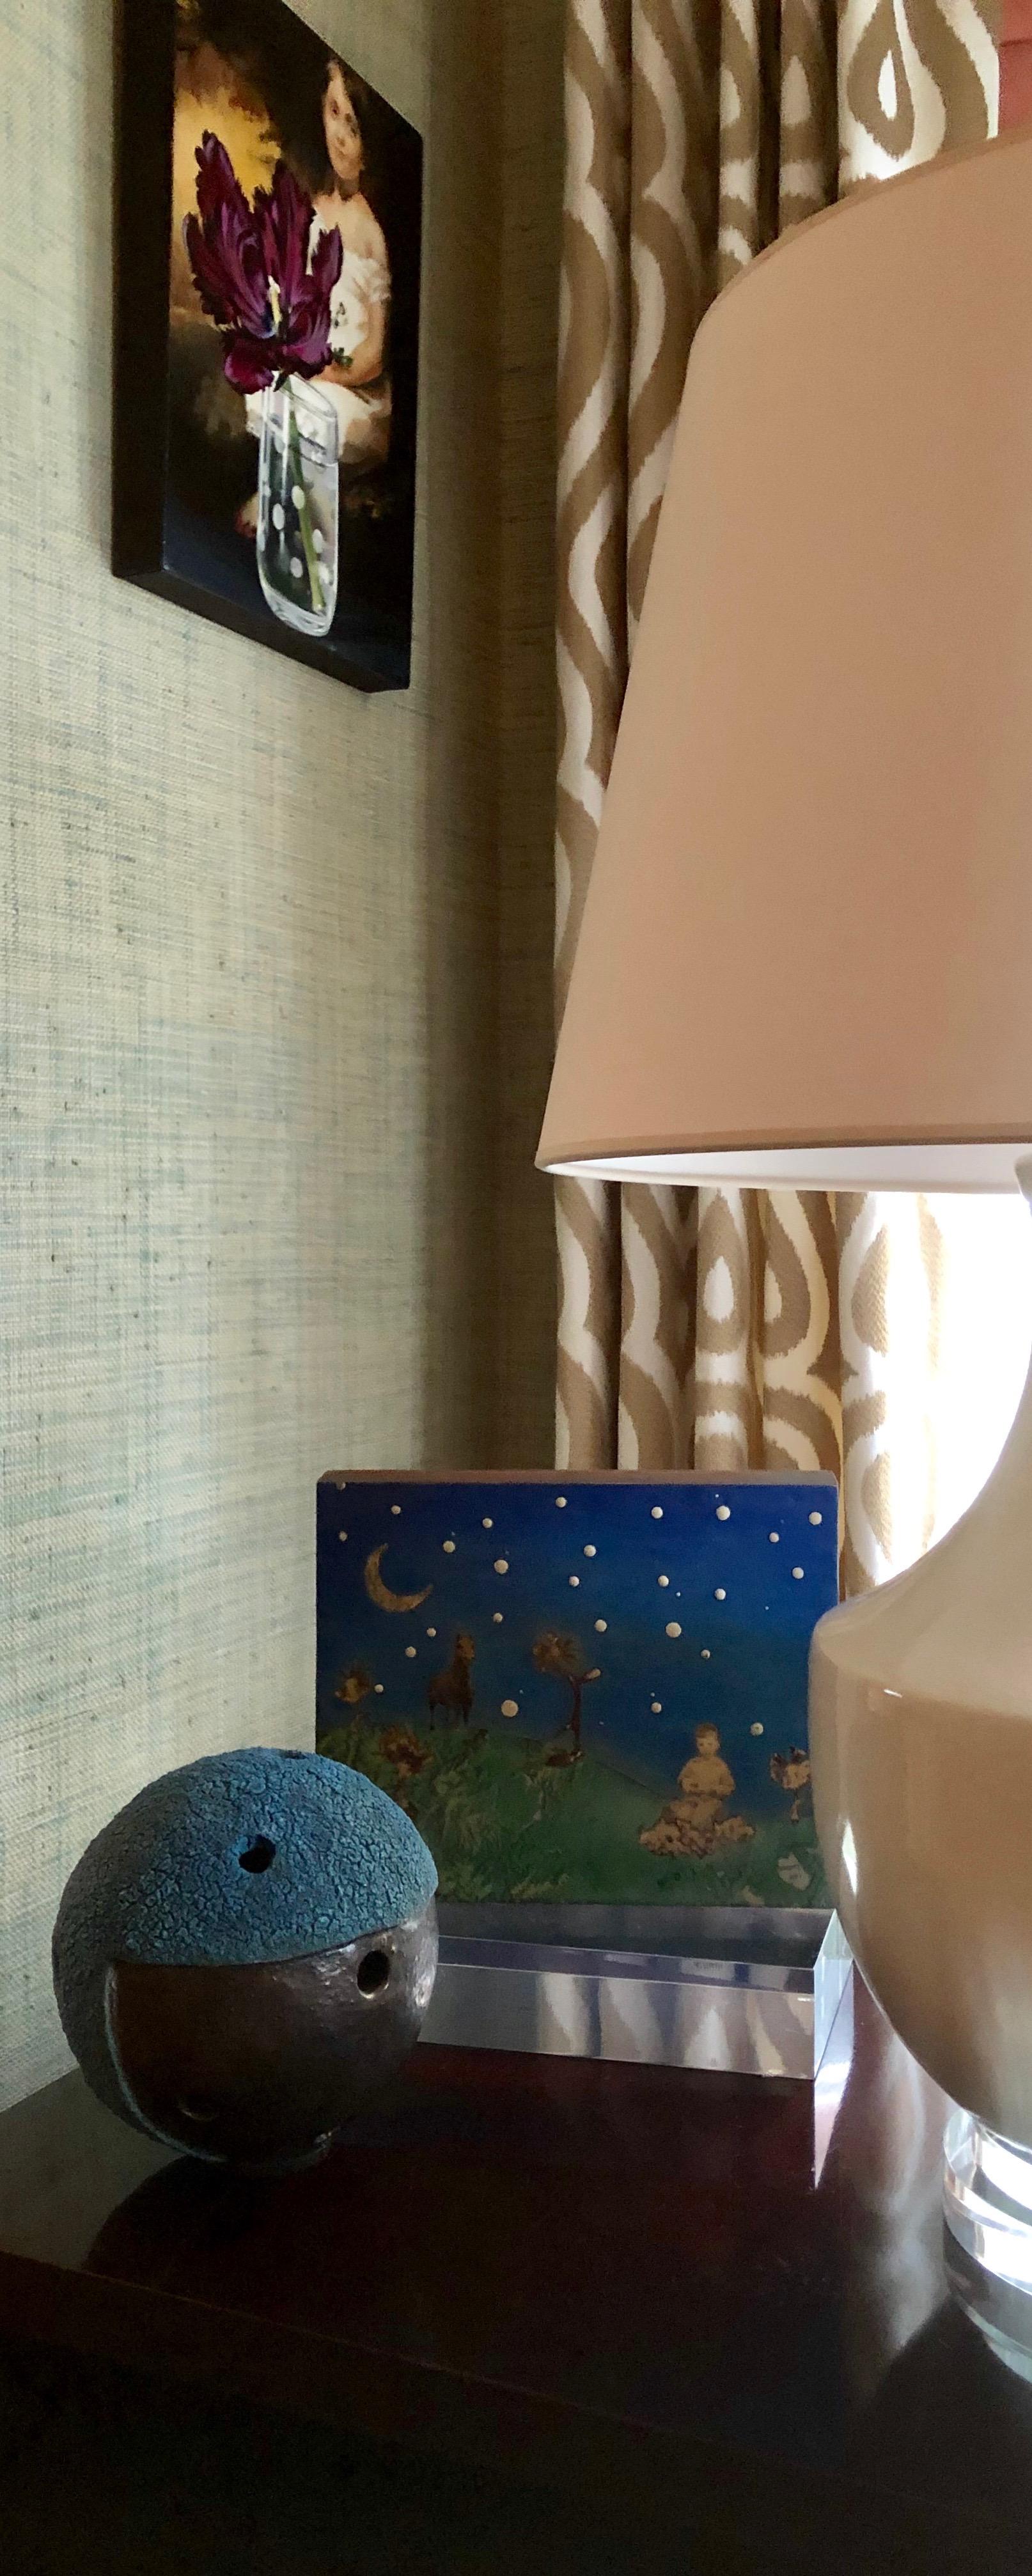 figurative work by sherrie wolf (hanging) + virginia scotchie ceramic sphere + encaustic by mirada lake